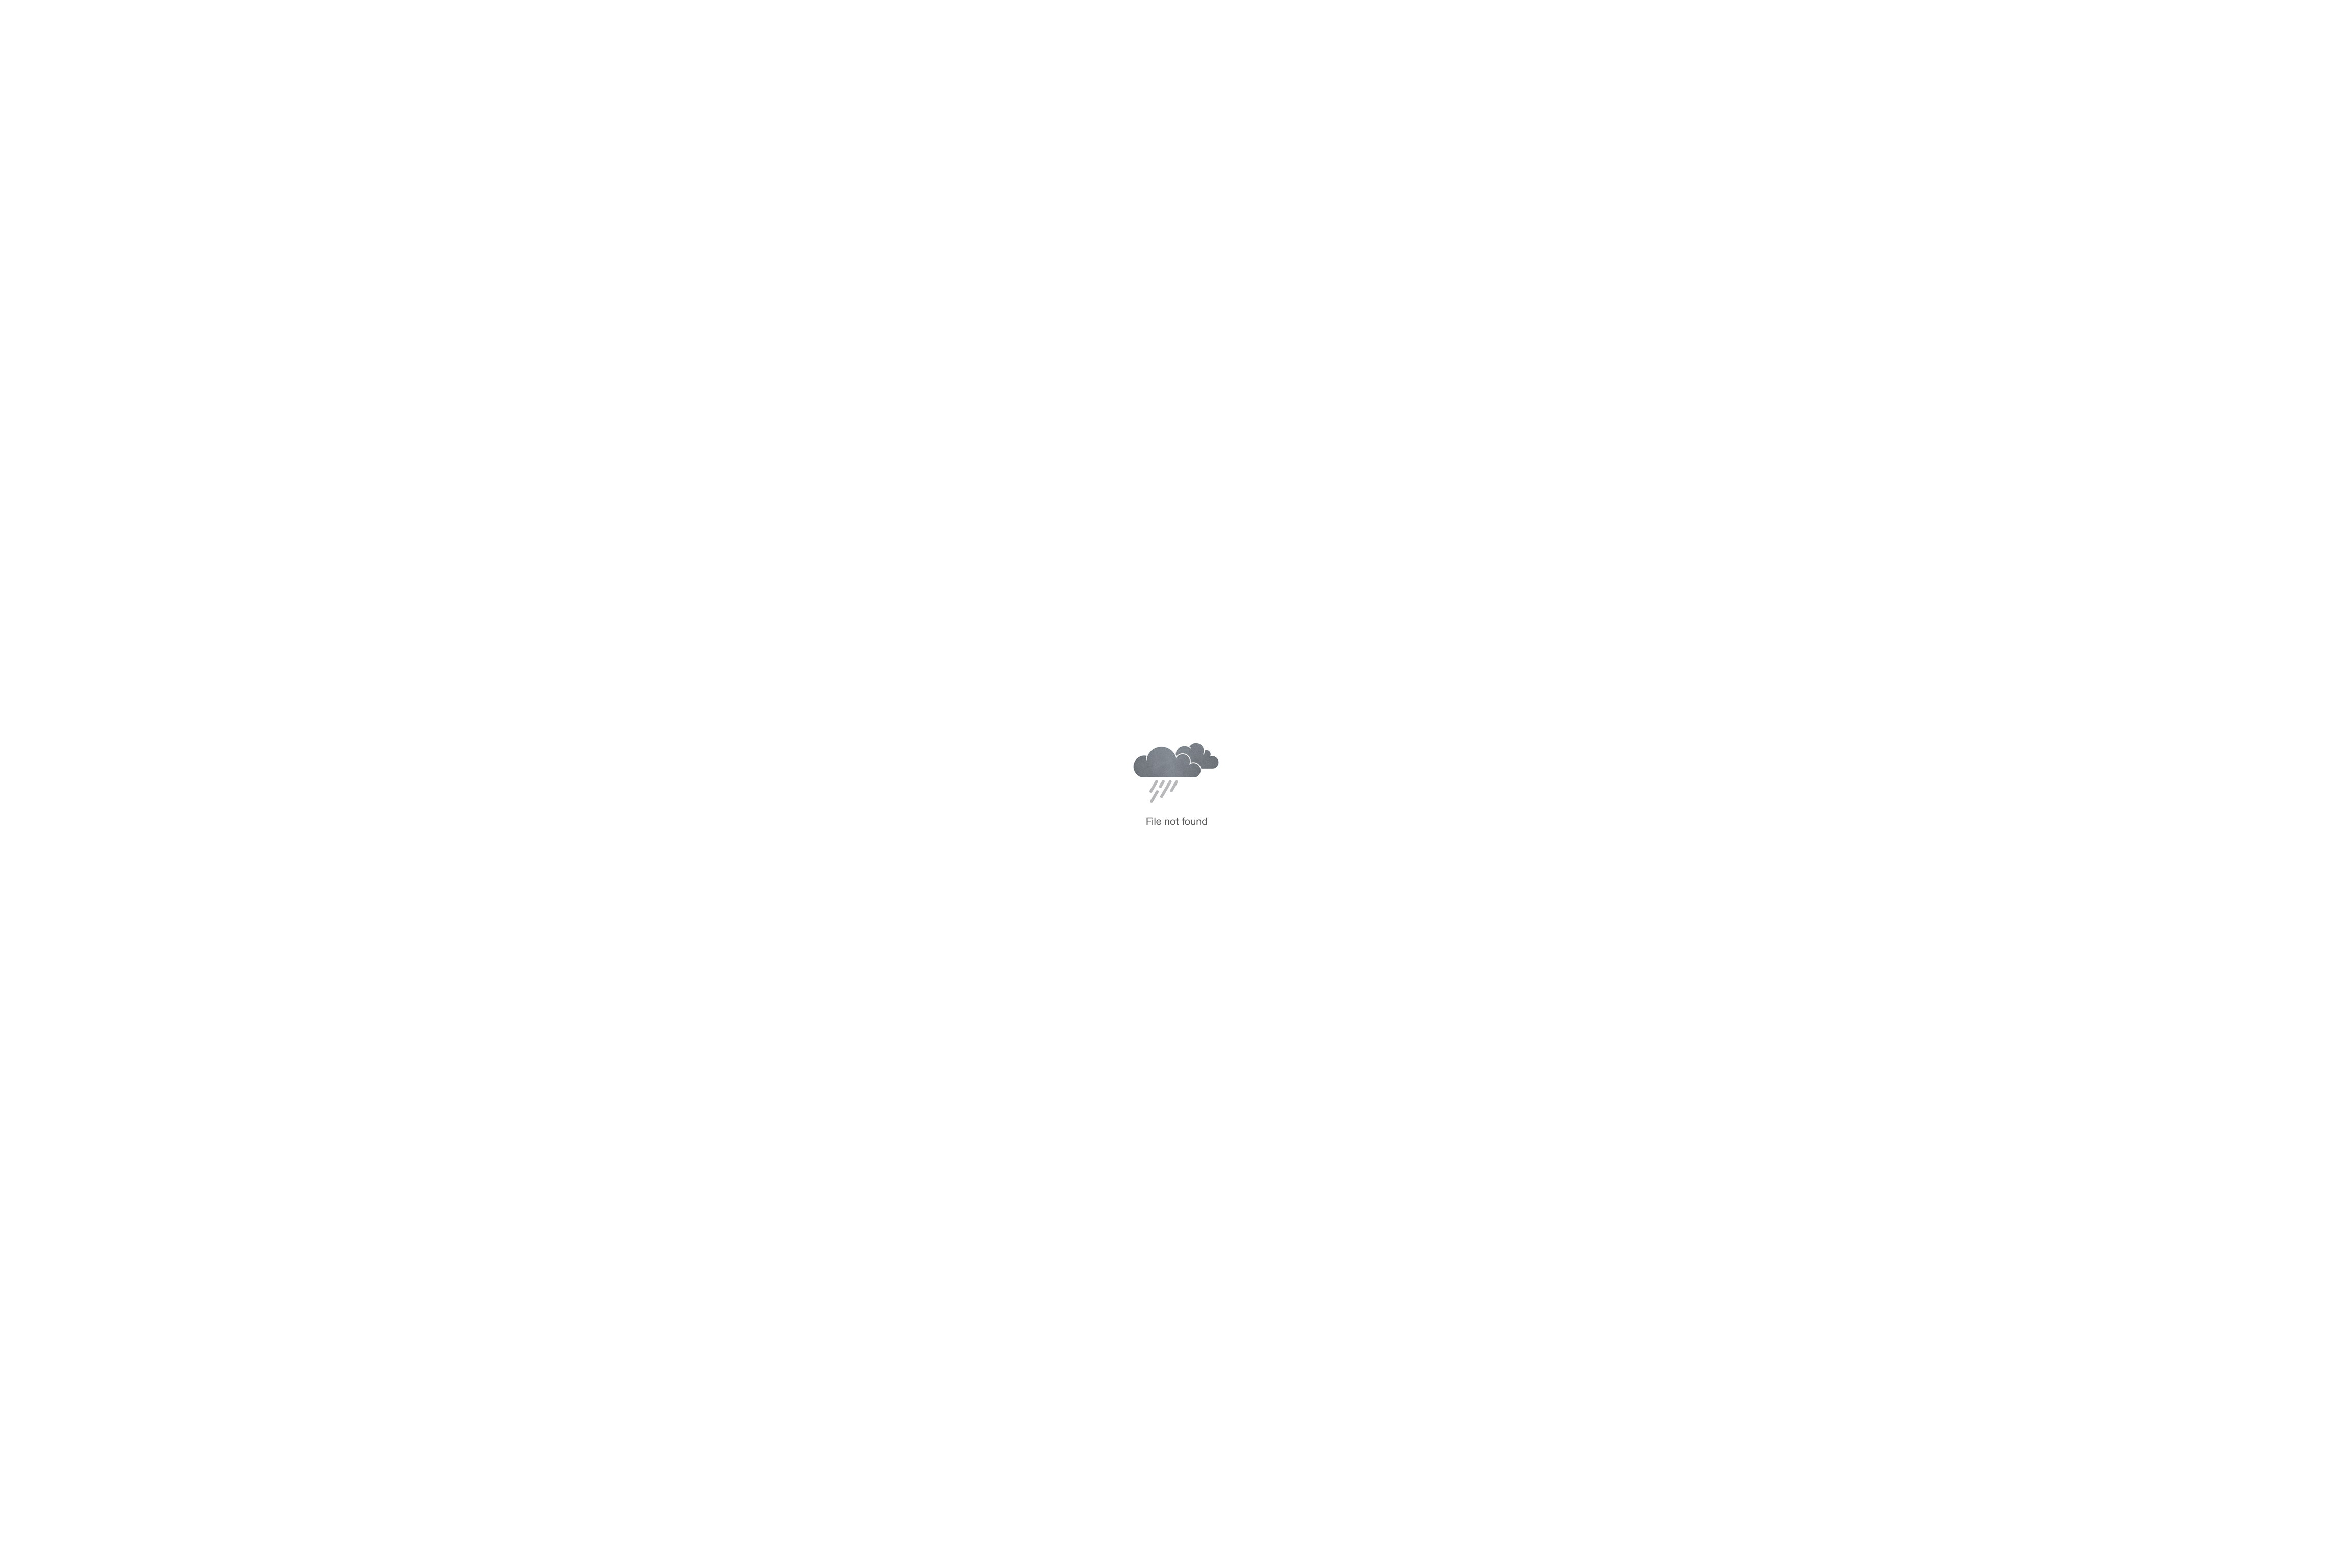 Antoine-PEDUZZI-Trail-Sponsorise-me-image-1